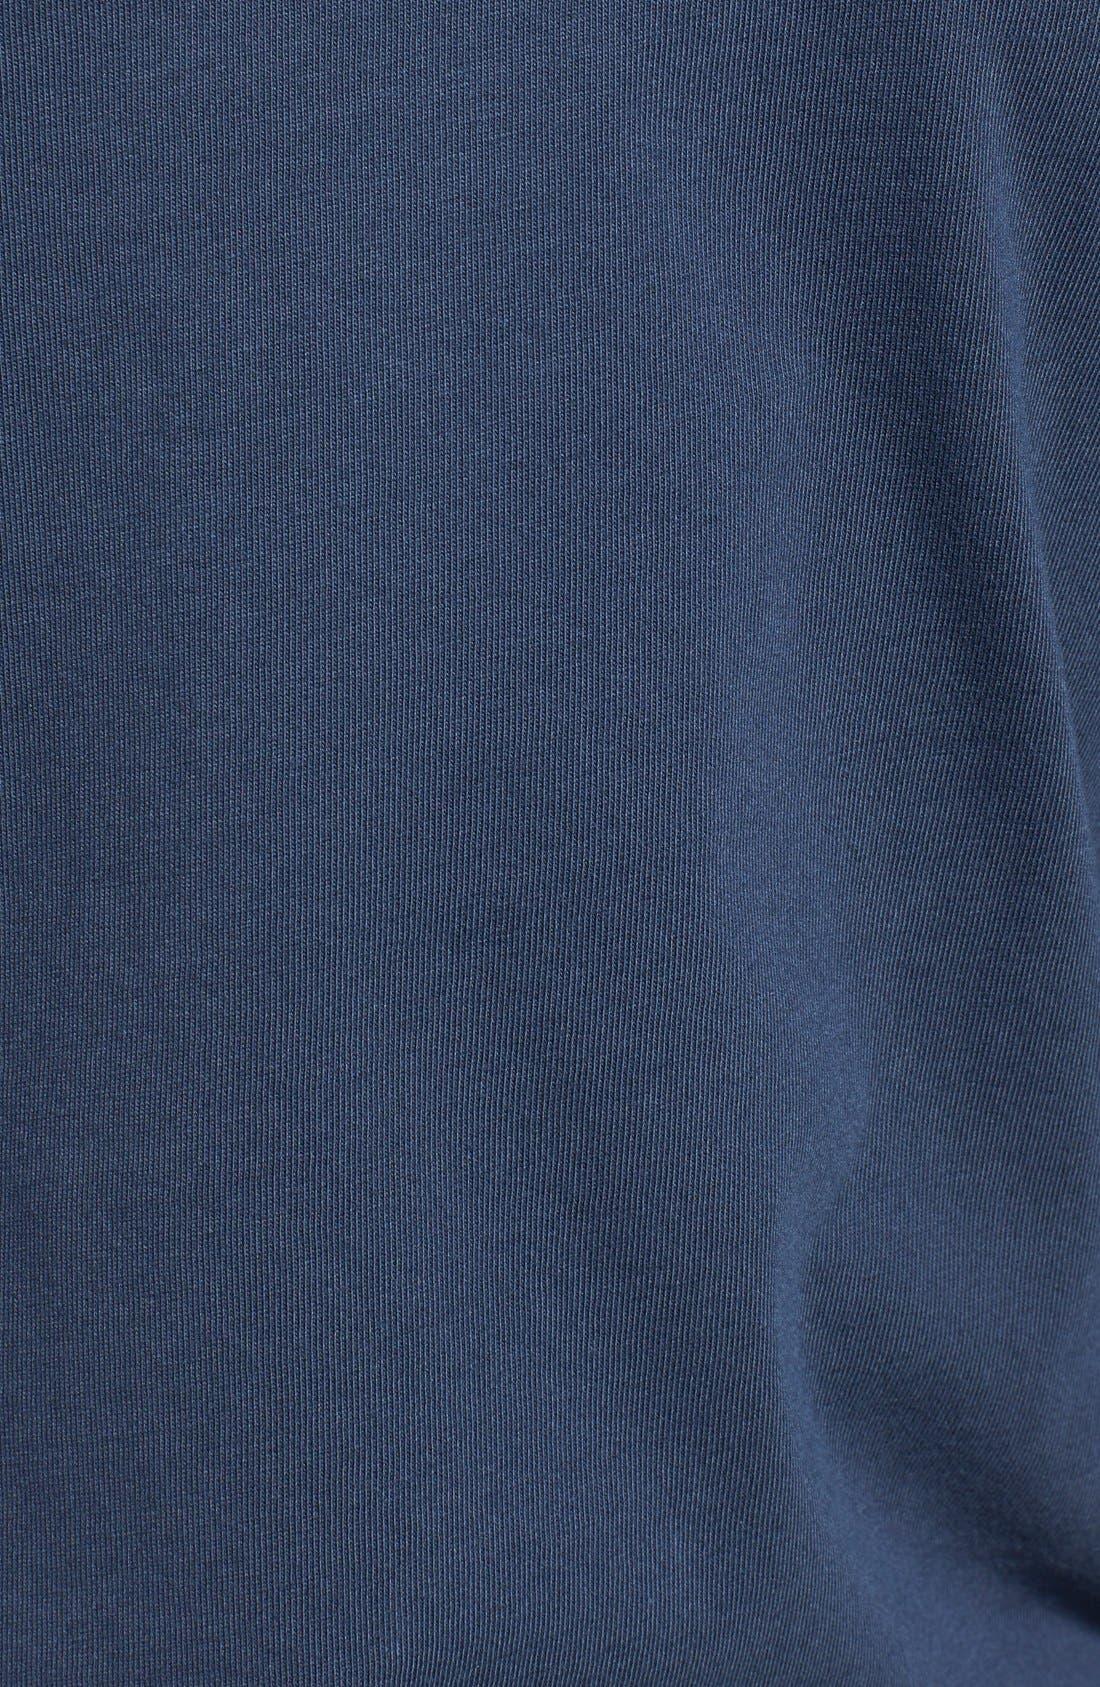 Logo Pocket Long Sleeve Crewneck T-Shirt,                             Alternate thumbnail 3, color,                             410